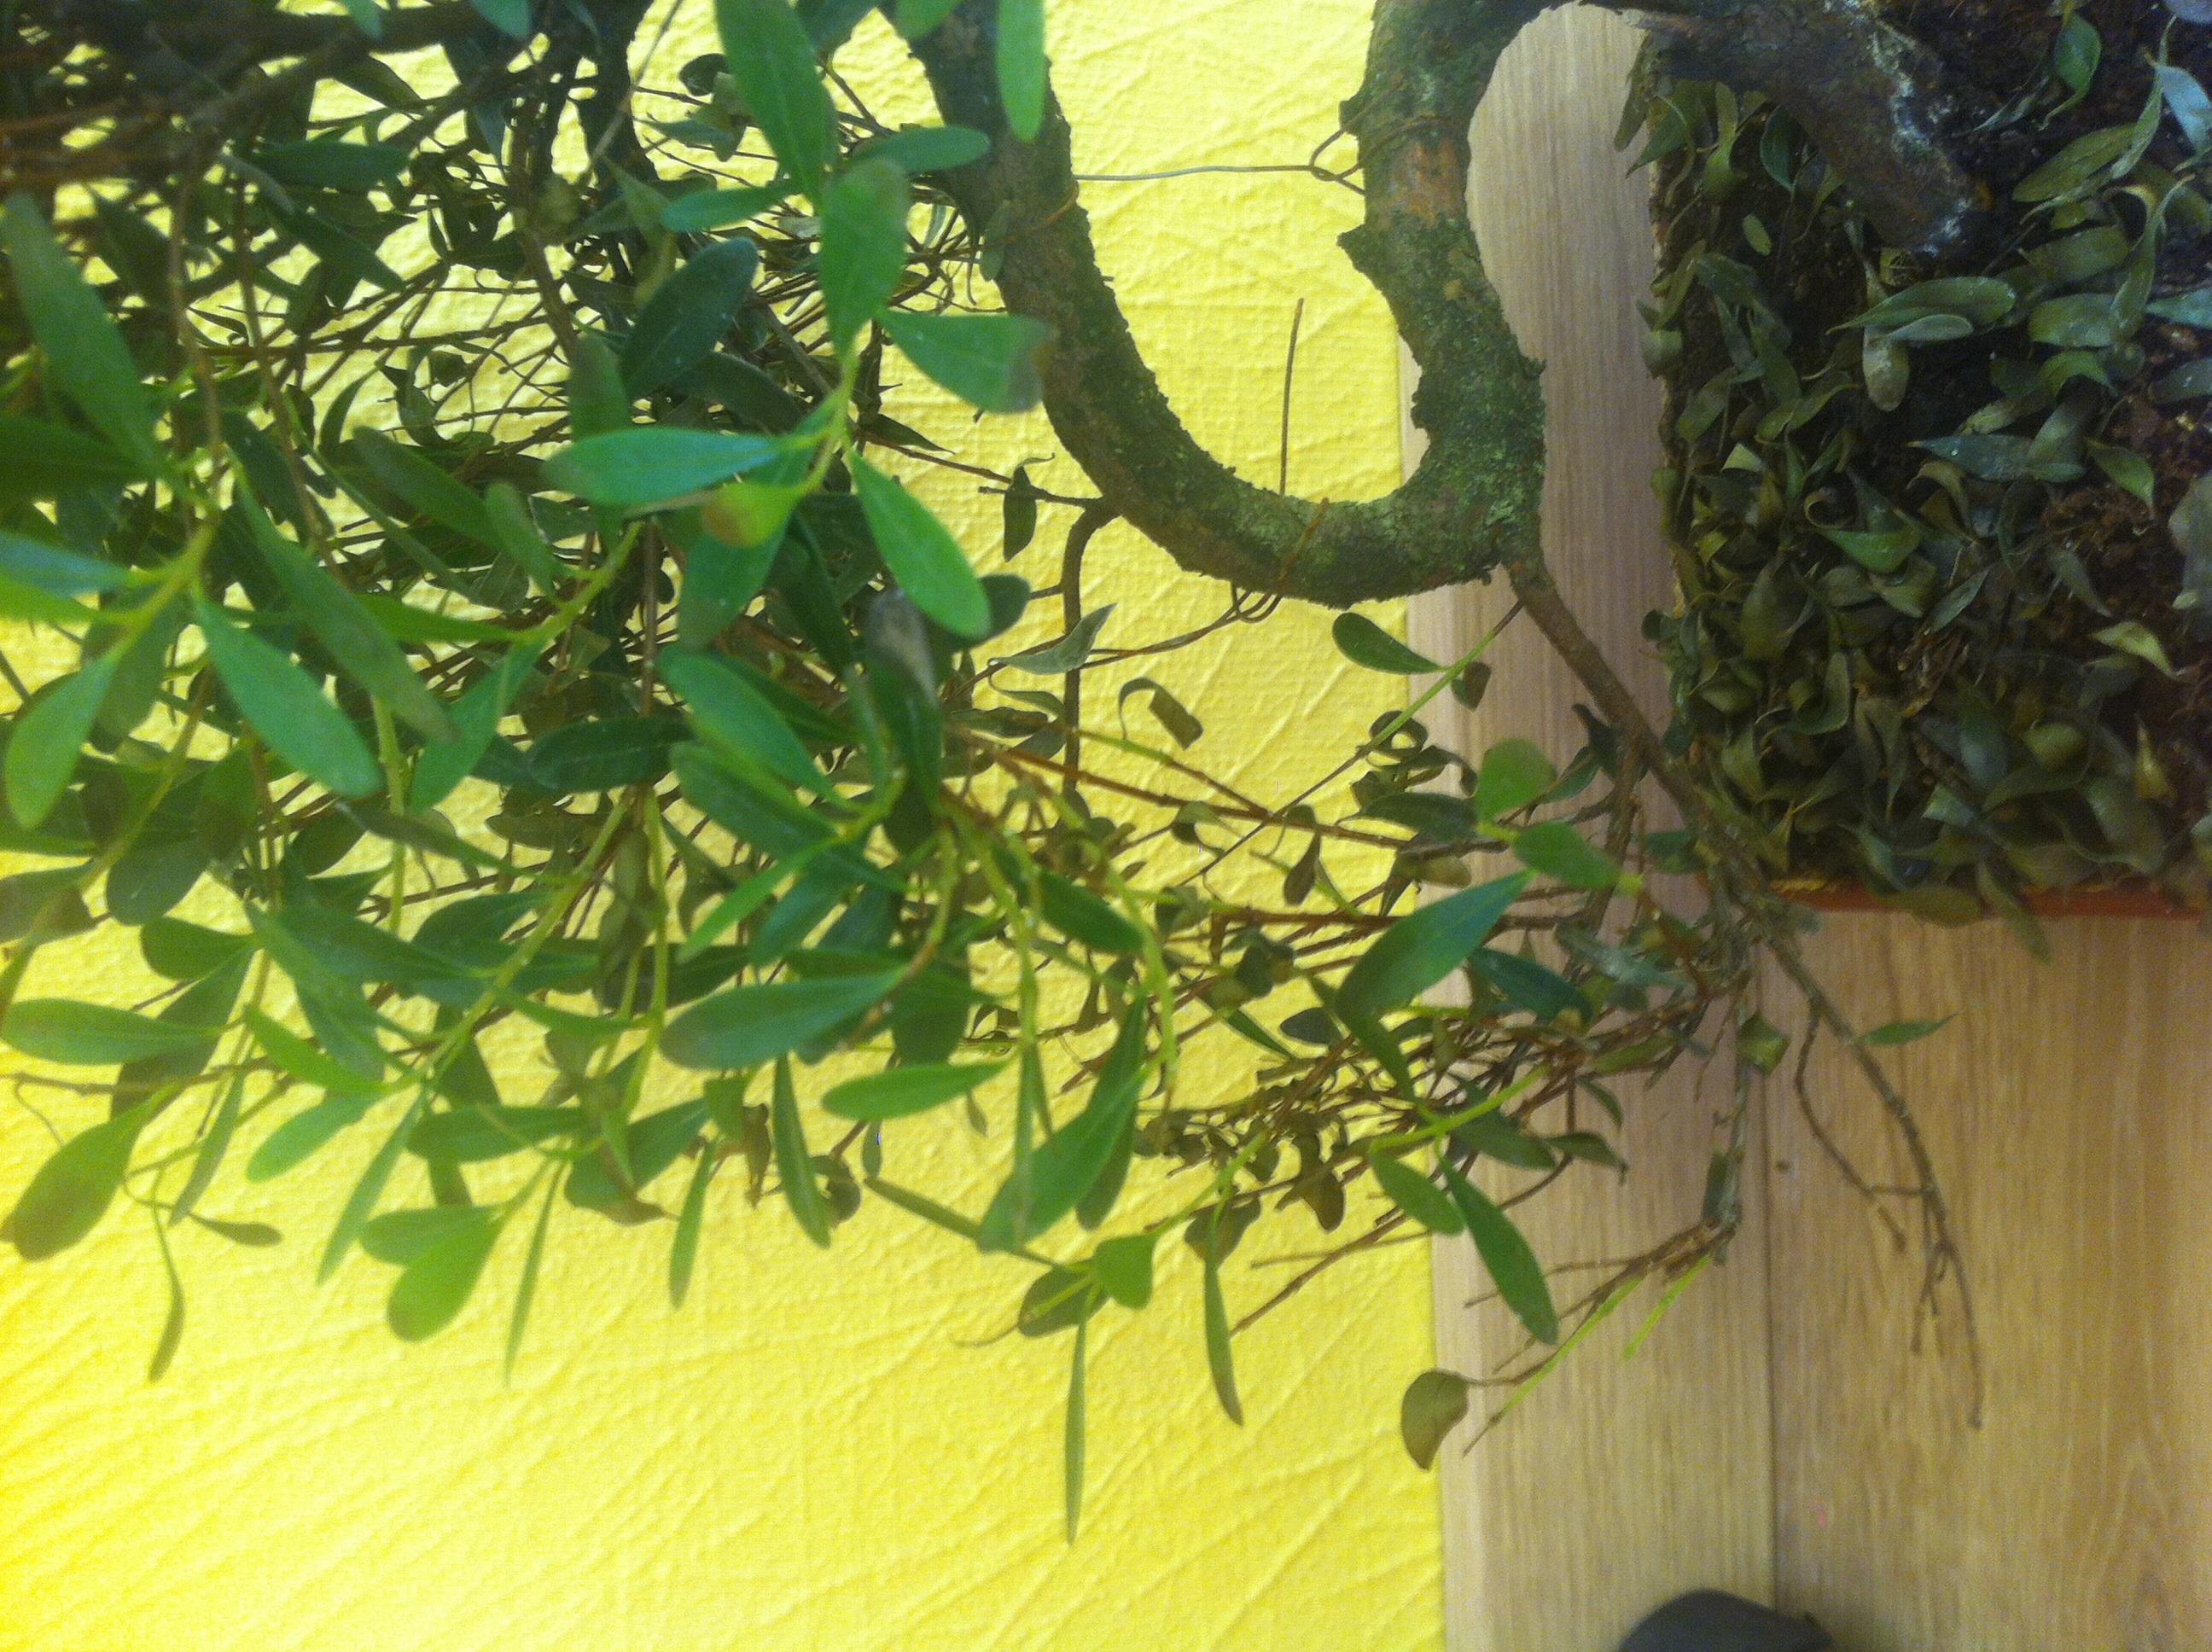 hilfe bonsai verliert alle bl tter garten pflanzen zimmerpflanzen. Black Bedroom Furniture Sets. Home Design Ideas